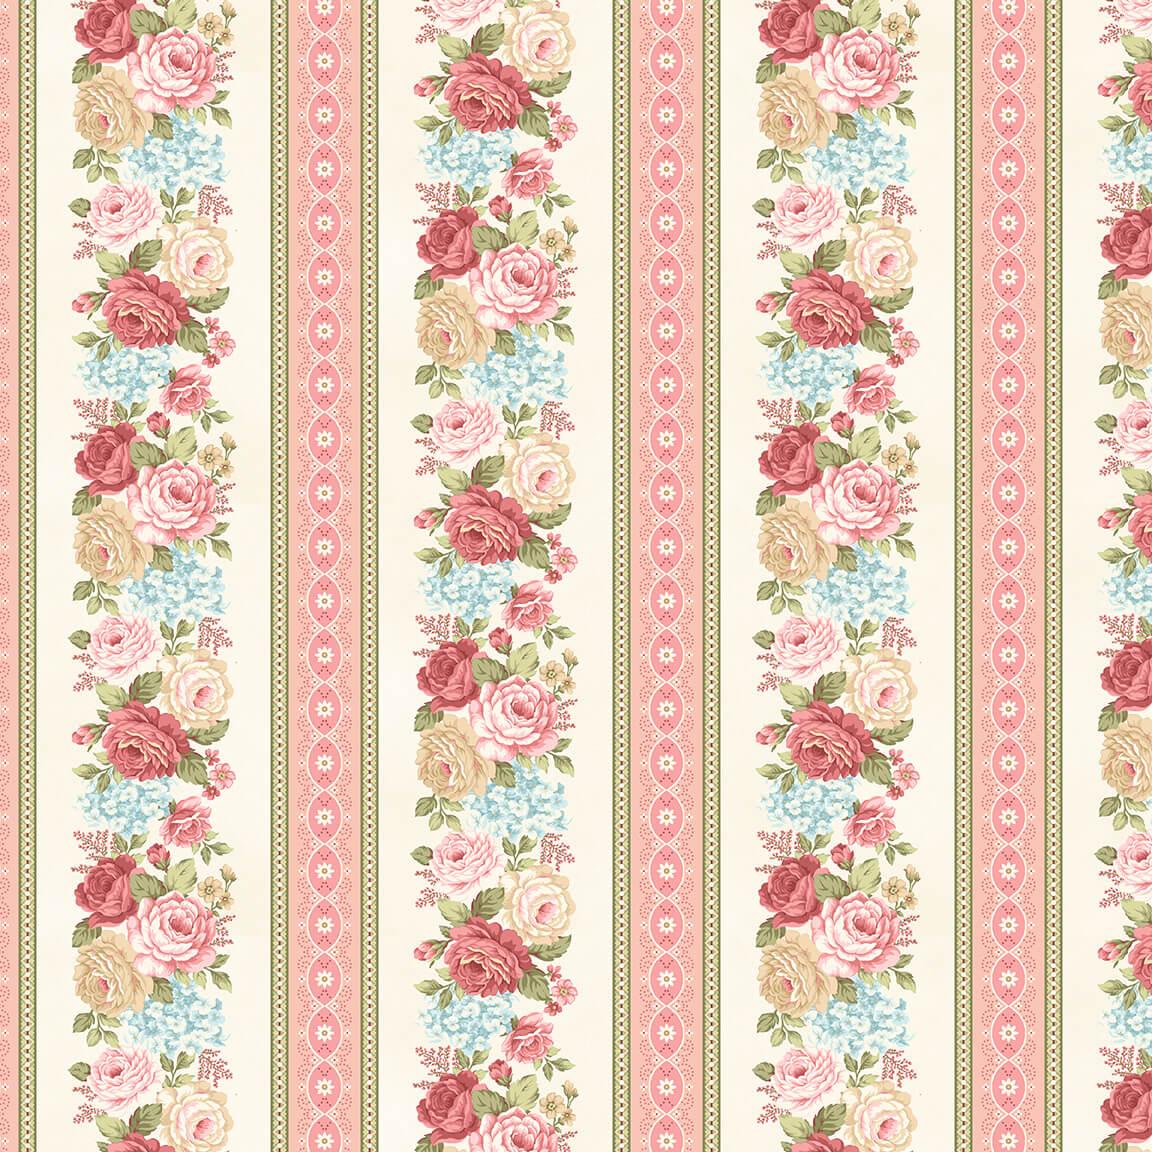 8697-44 Cream Floral Border Strip Flannel